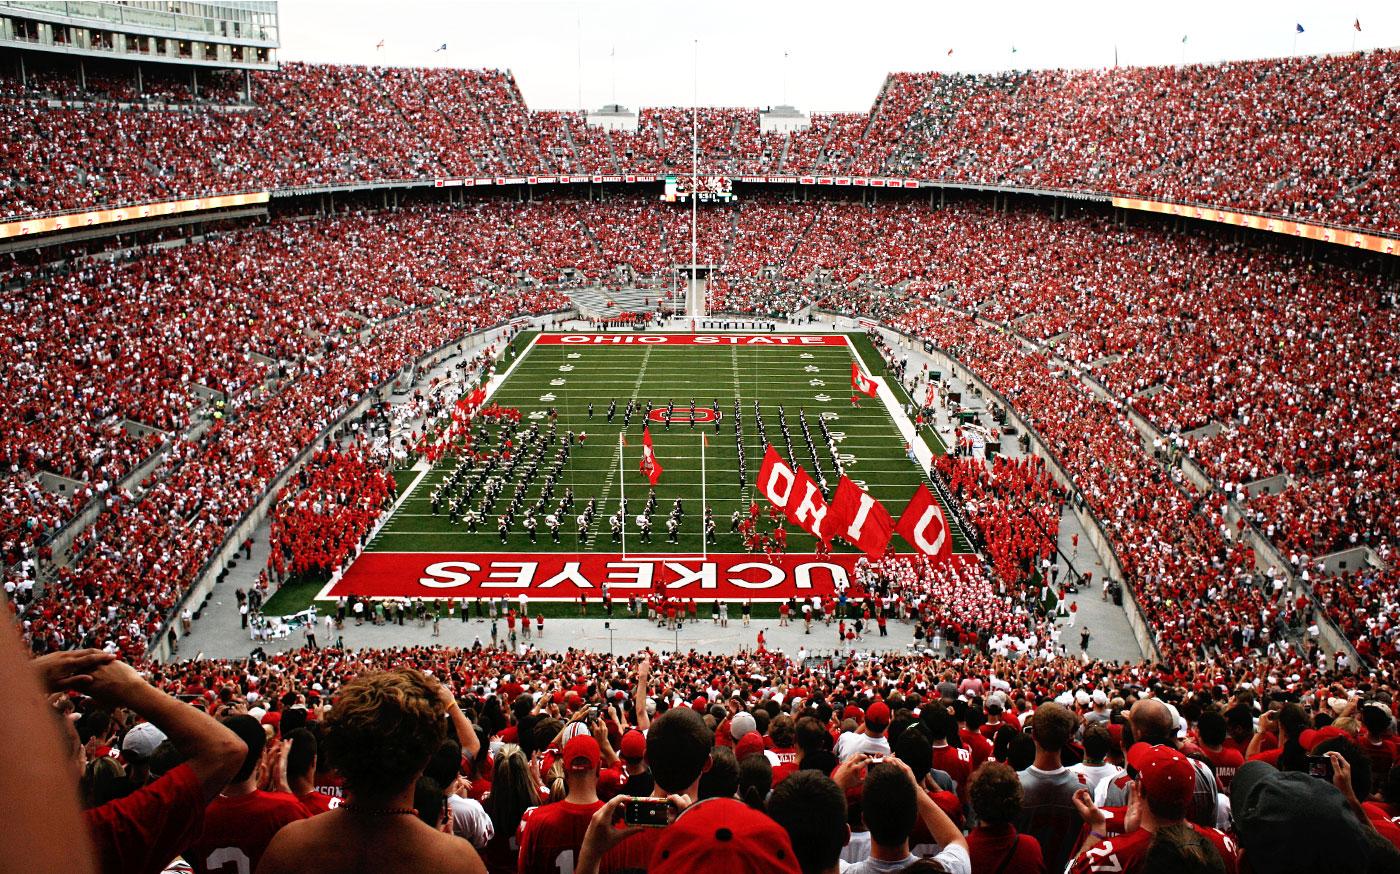 Ohio State Football Wallpaper >> Ohio Stadium Desktop Wallpaper - WallpaperSafari